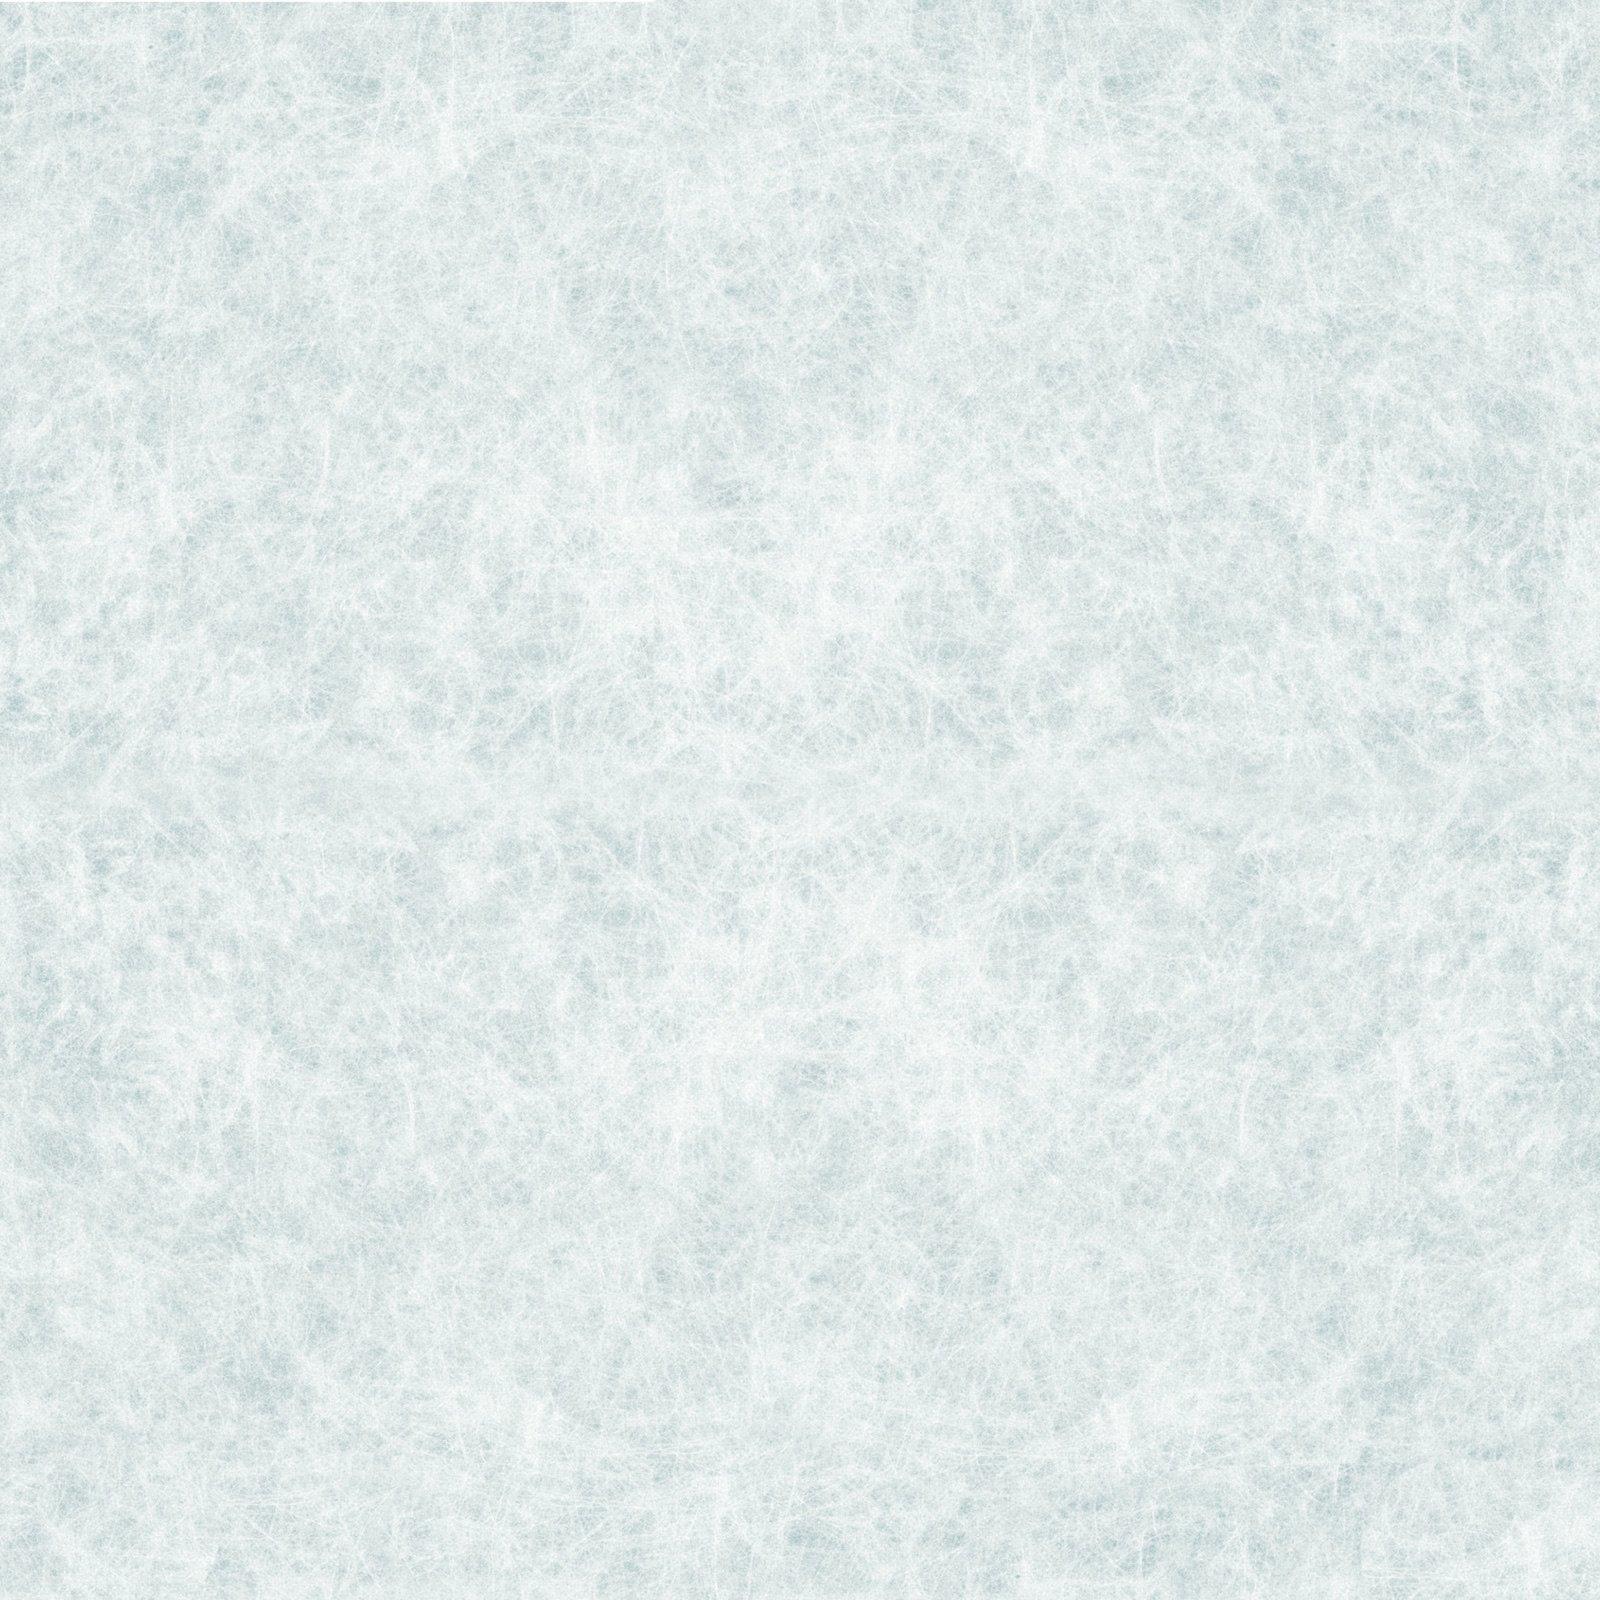 d-c fix Glasfolie REISPAPIER - 67,5x200 cm